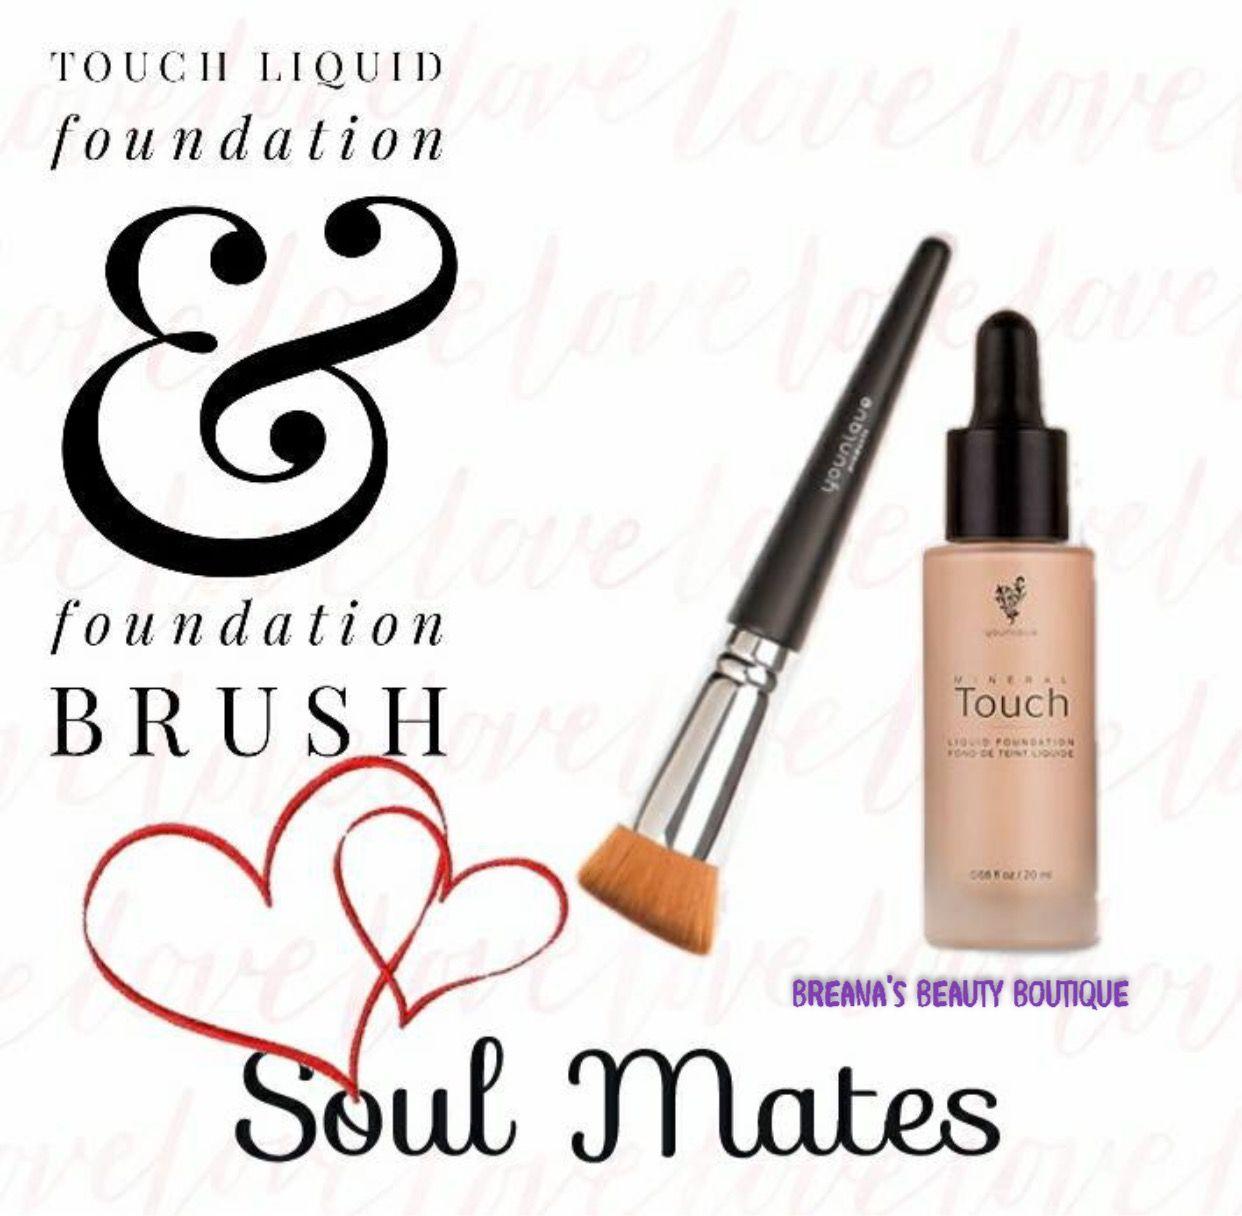 Liquid foundation & brush Liquid foundation brush